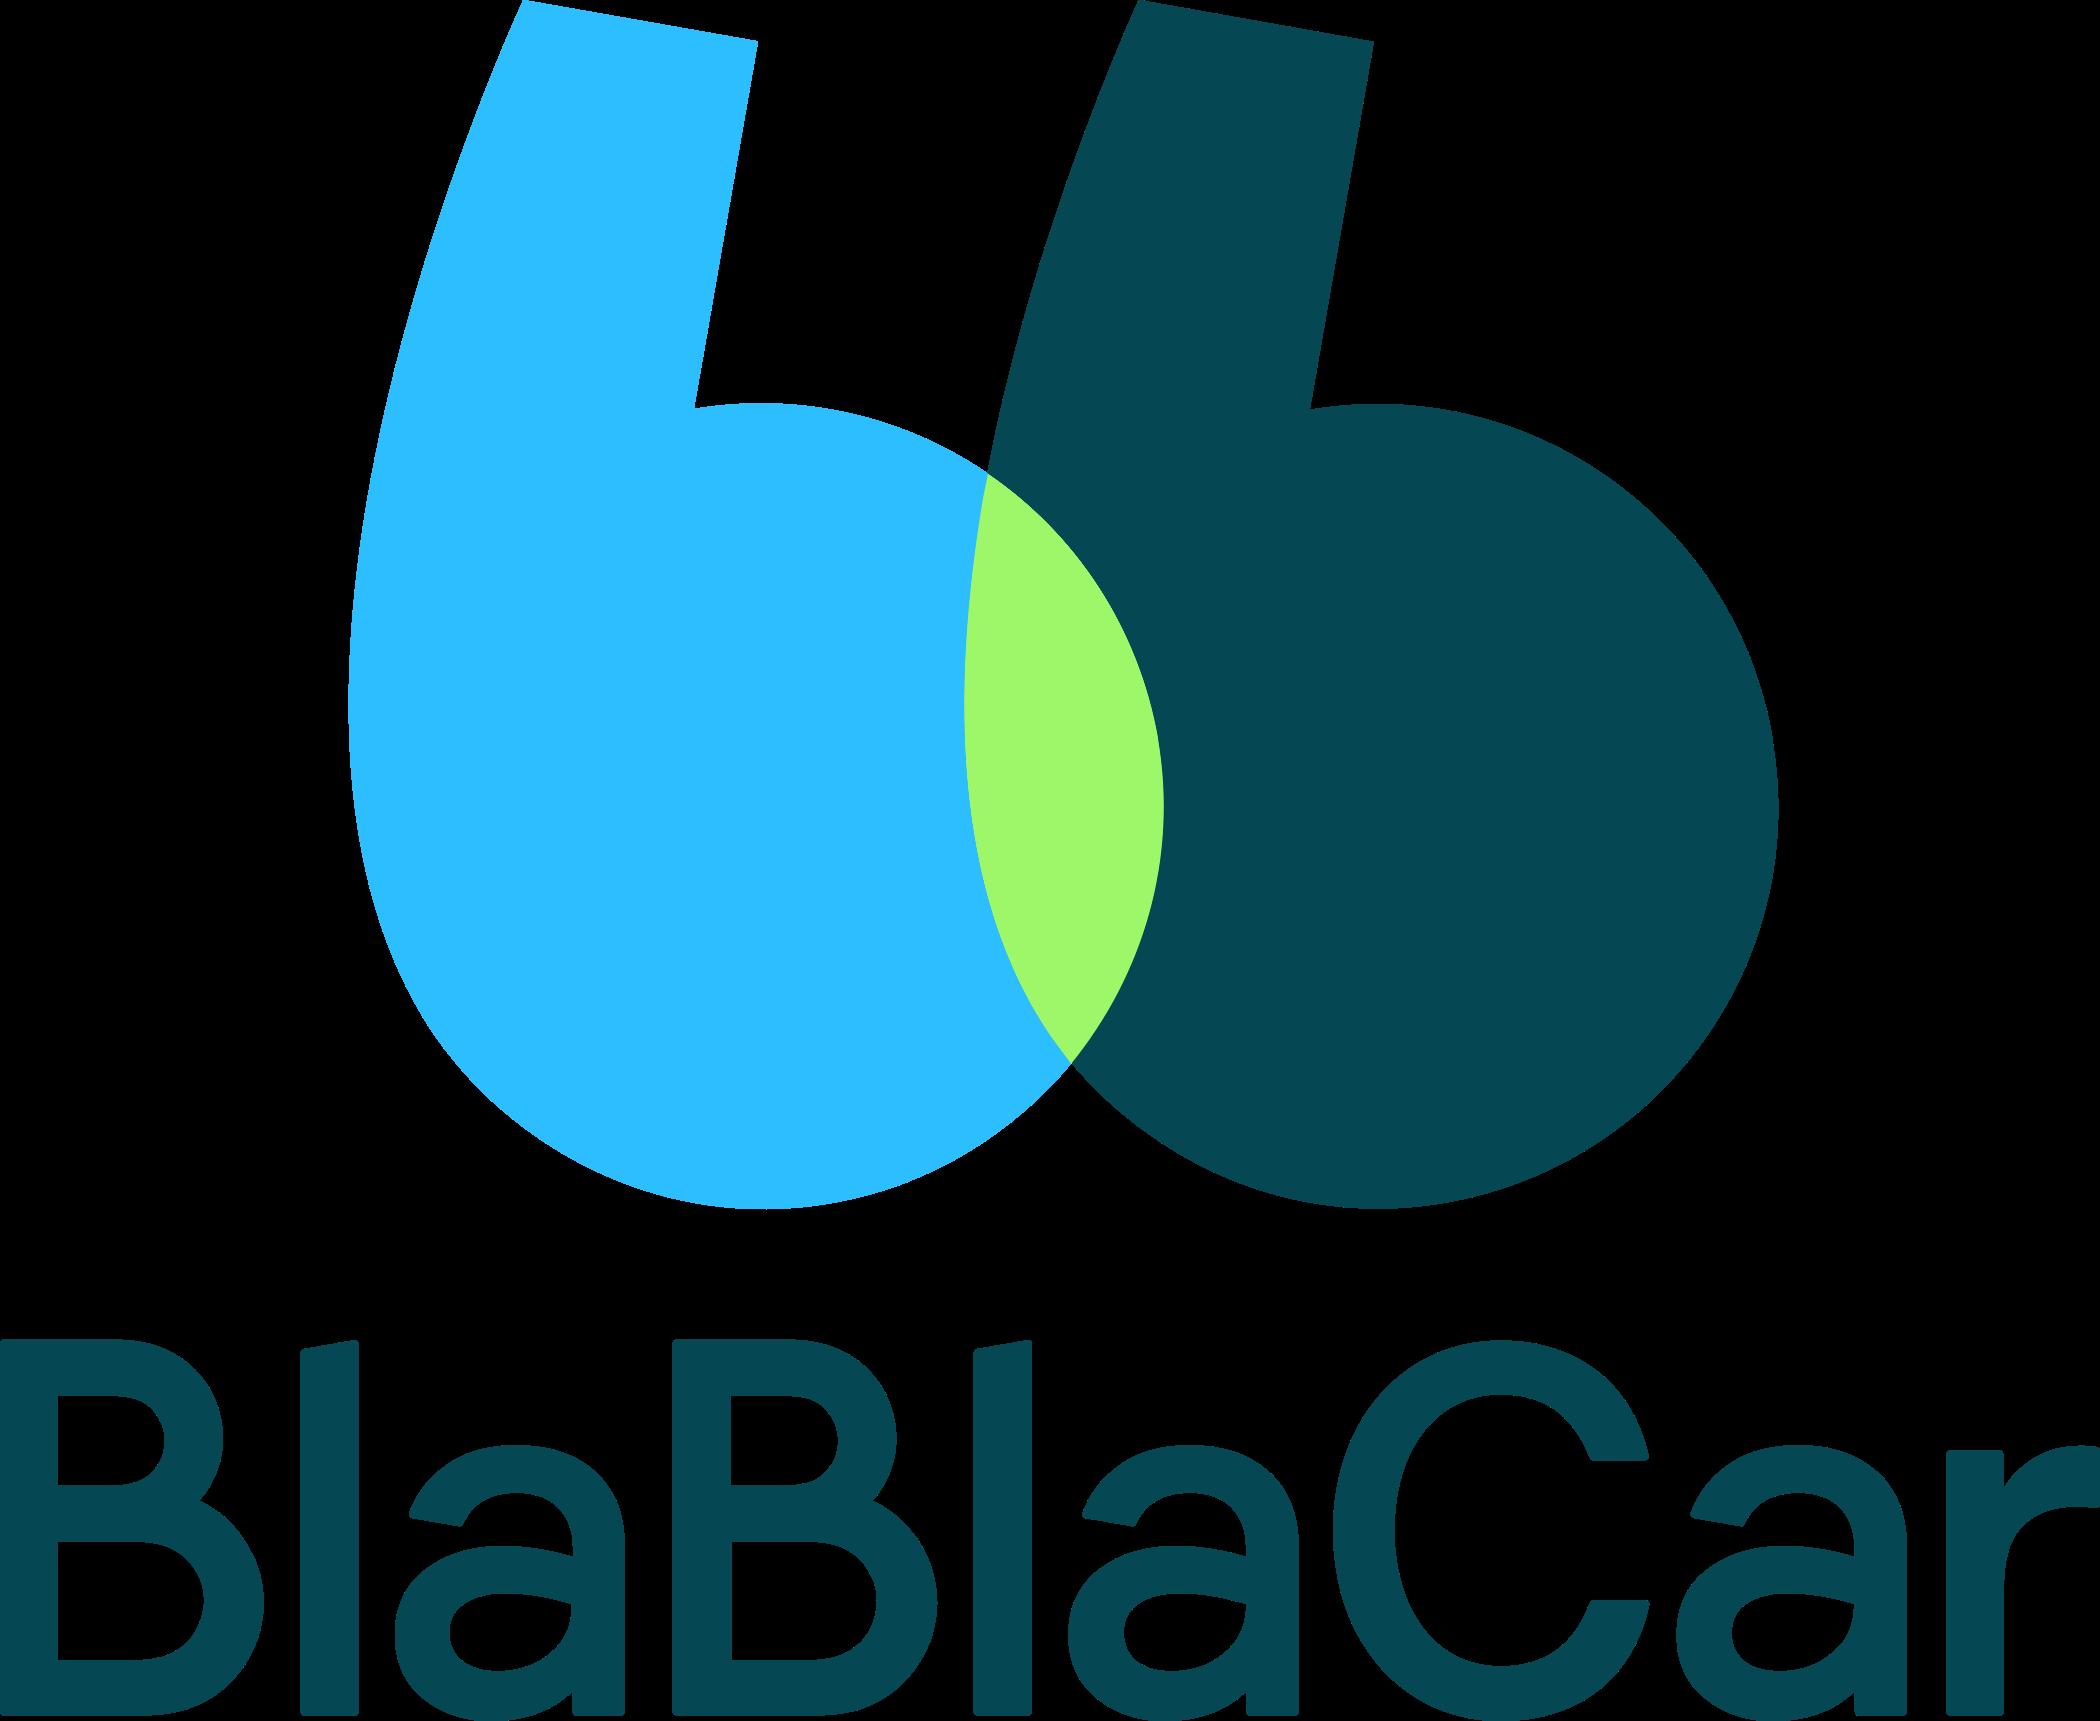 blablacar-logo-3